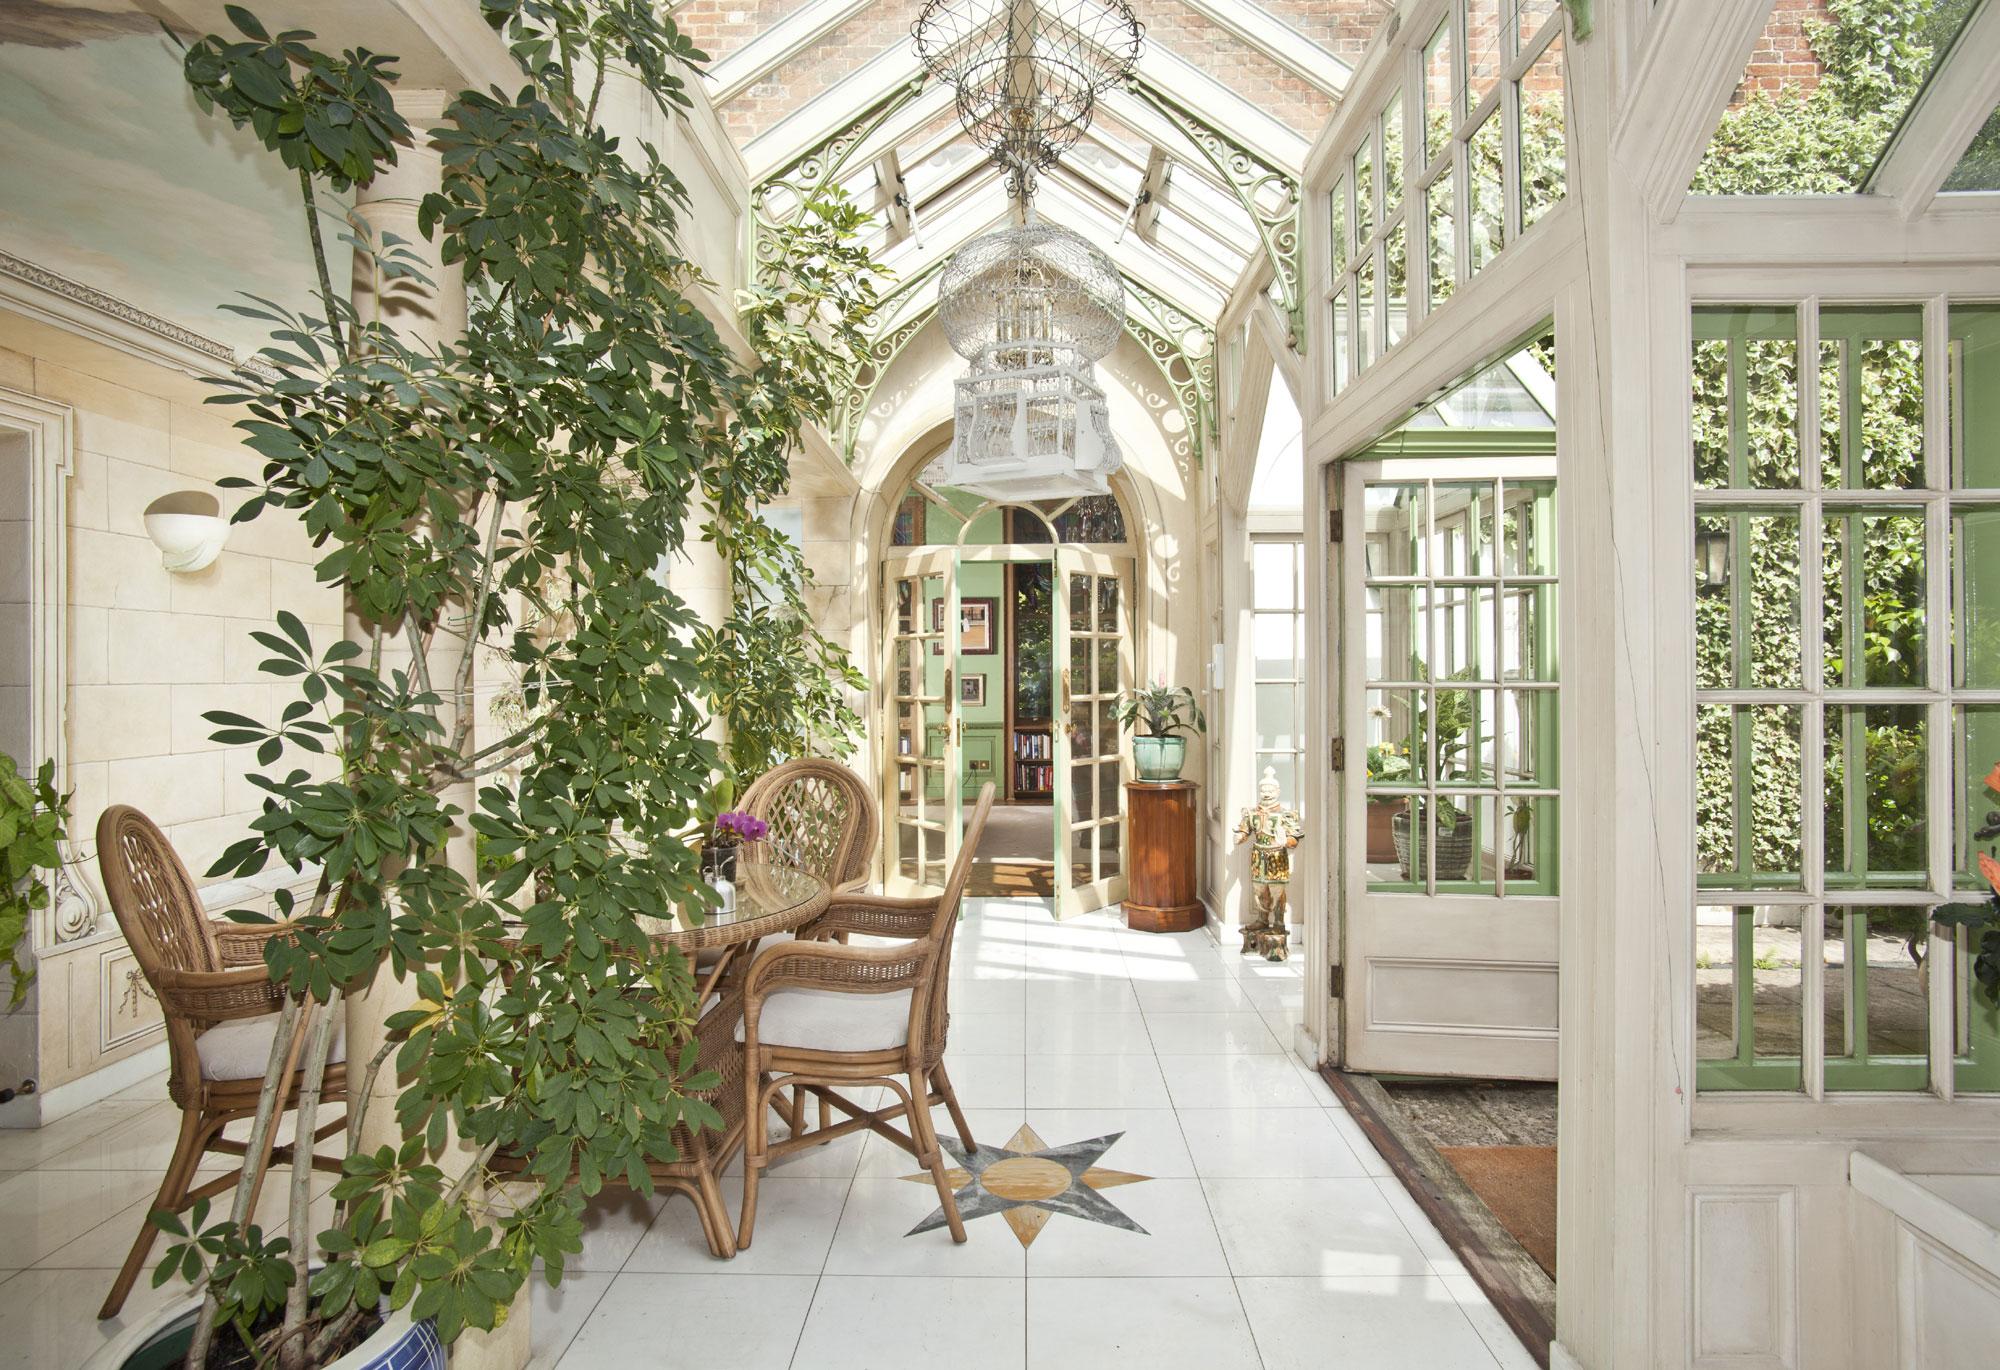 John Gays House, a Tudor estate in the Berkshire village of Holyport, has an elegant conservatory overlooking splendid formal gardens.